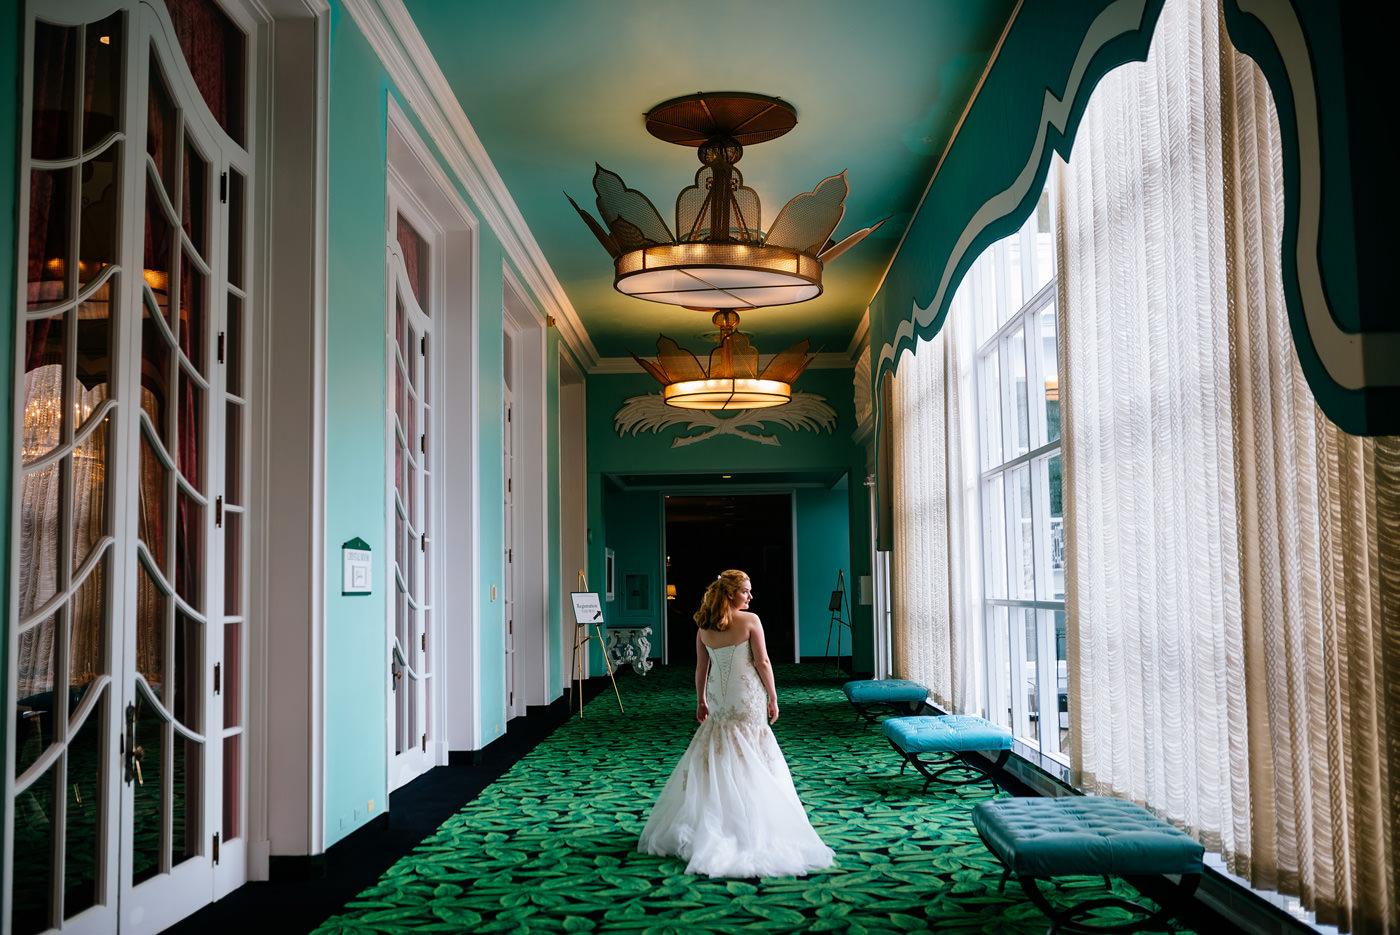 wv weddings greenbrier resort wedding bride